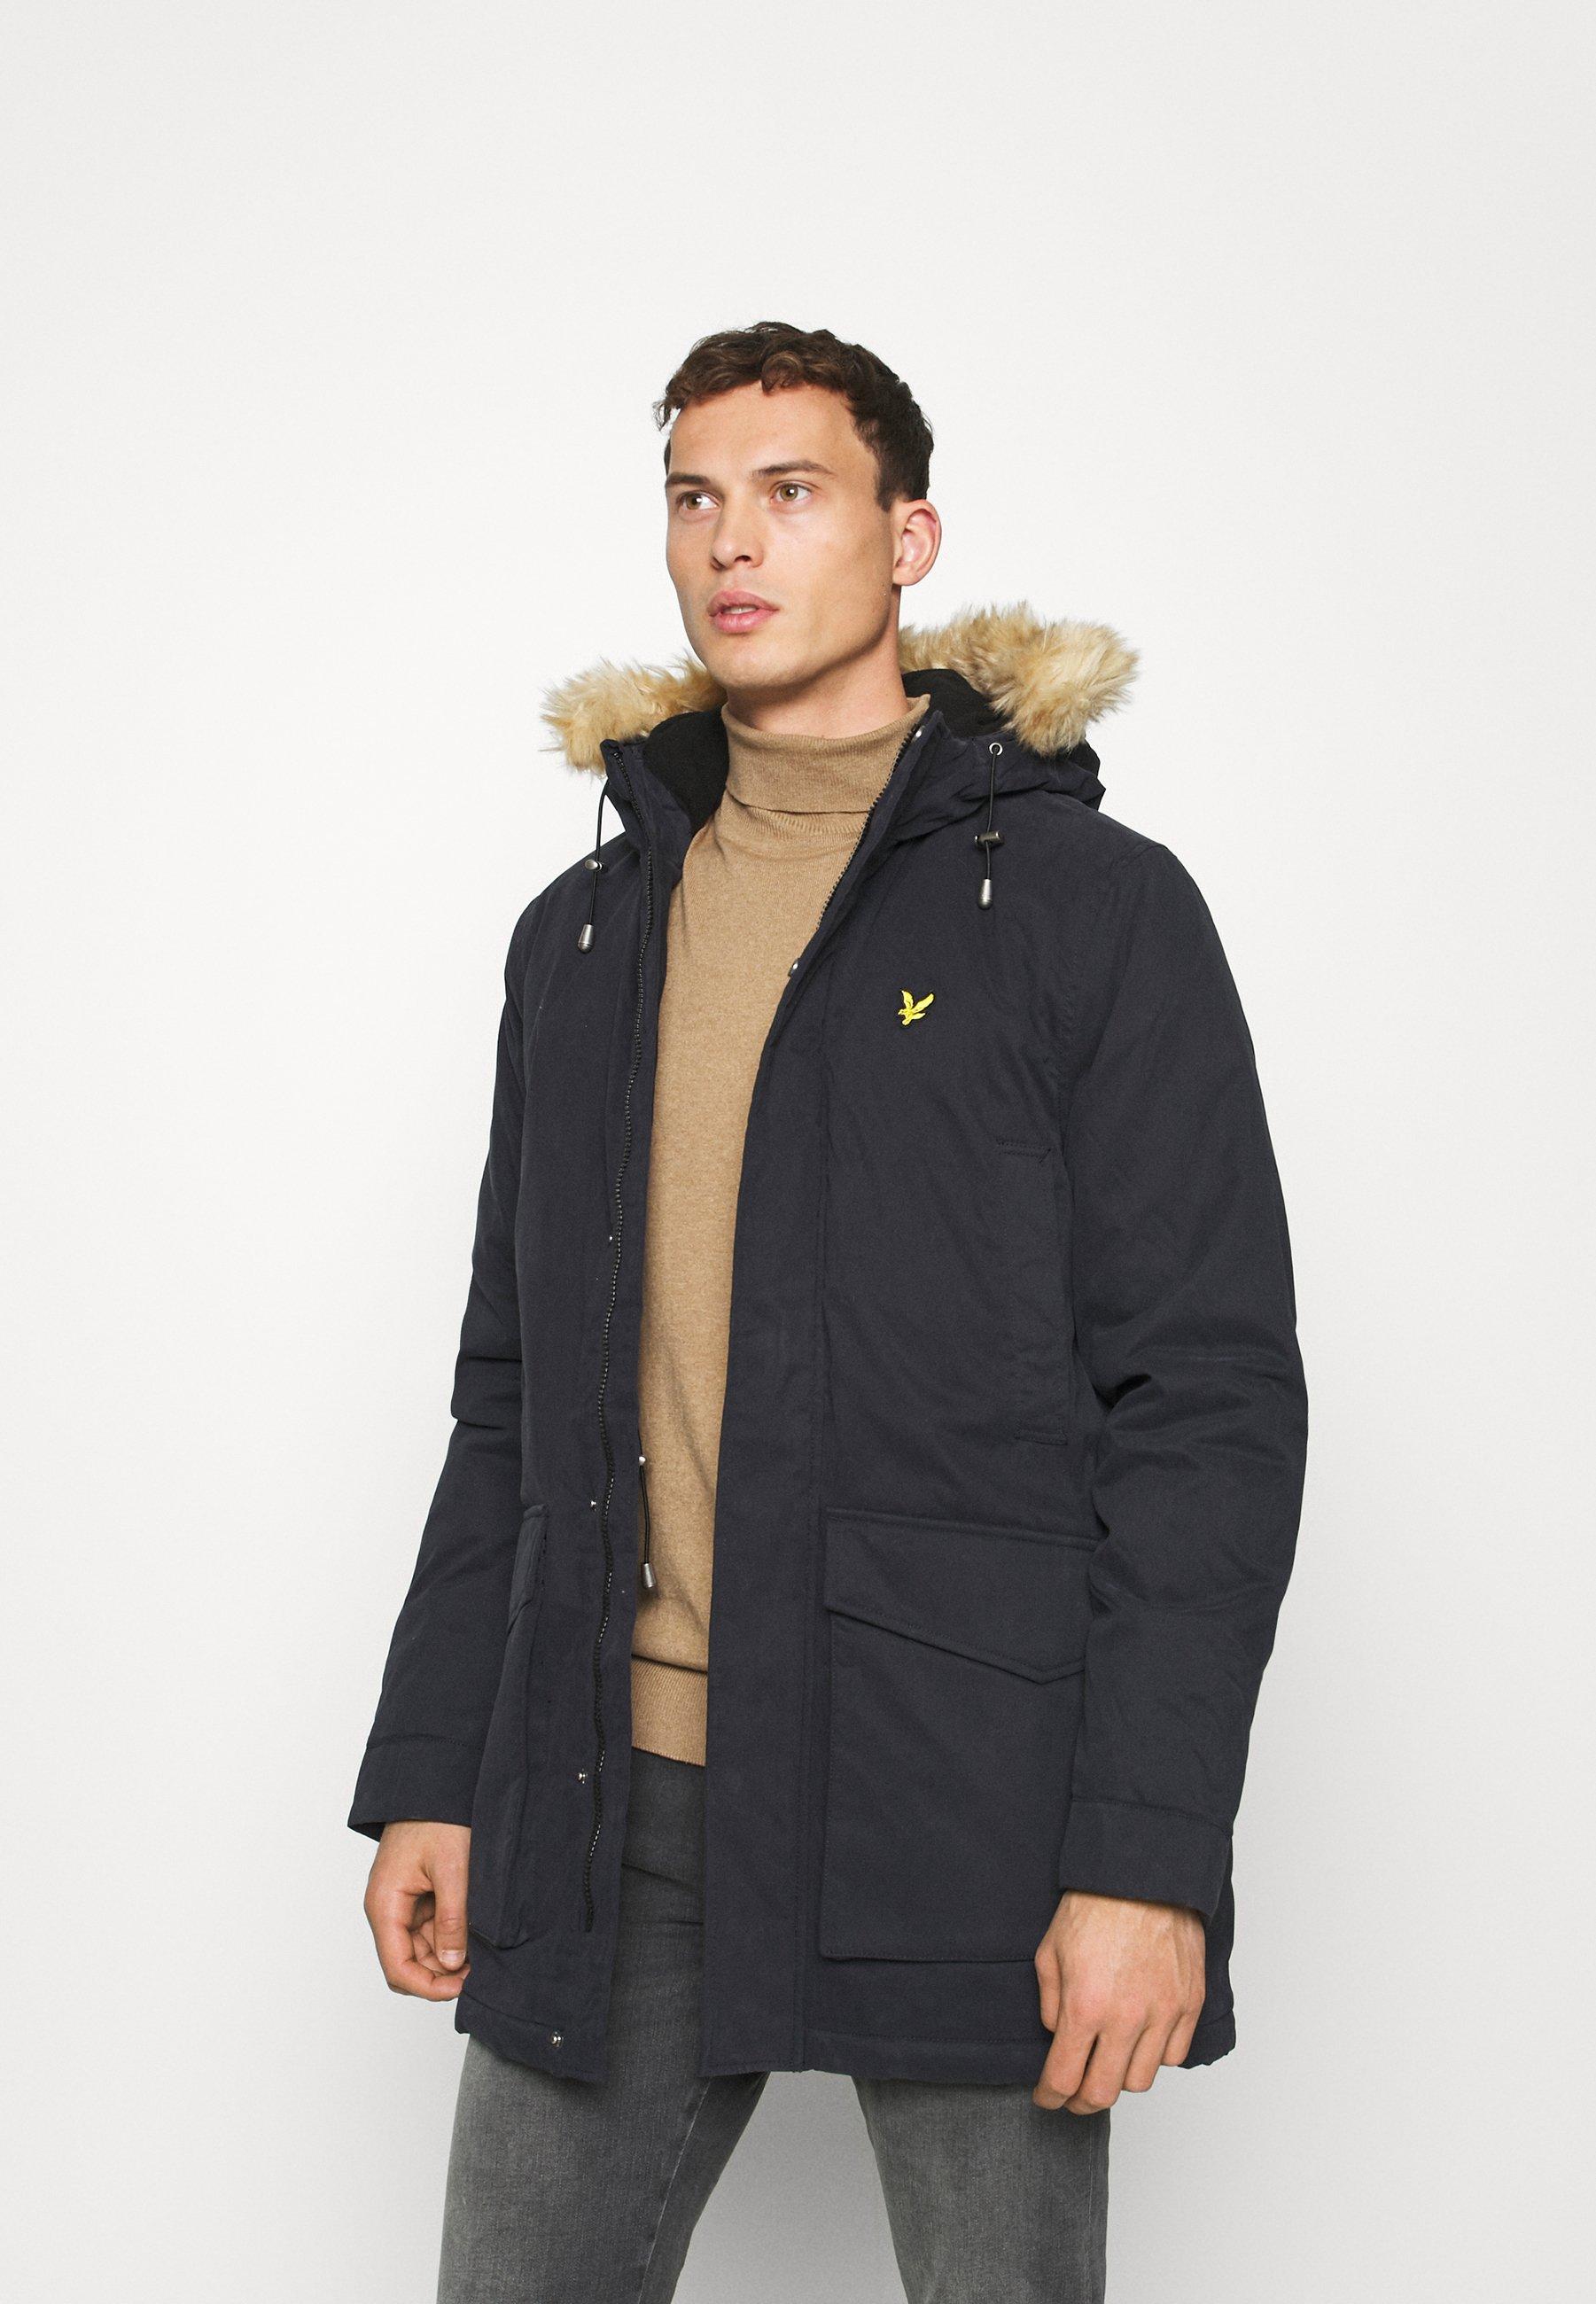 Homme WINTER WEIGHT - Veste d'hiver